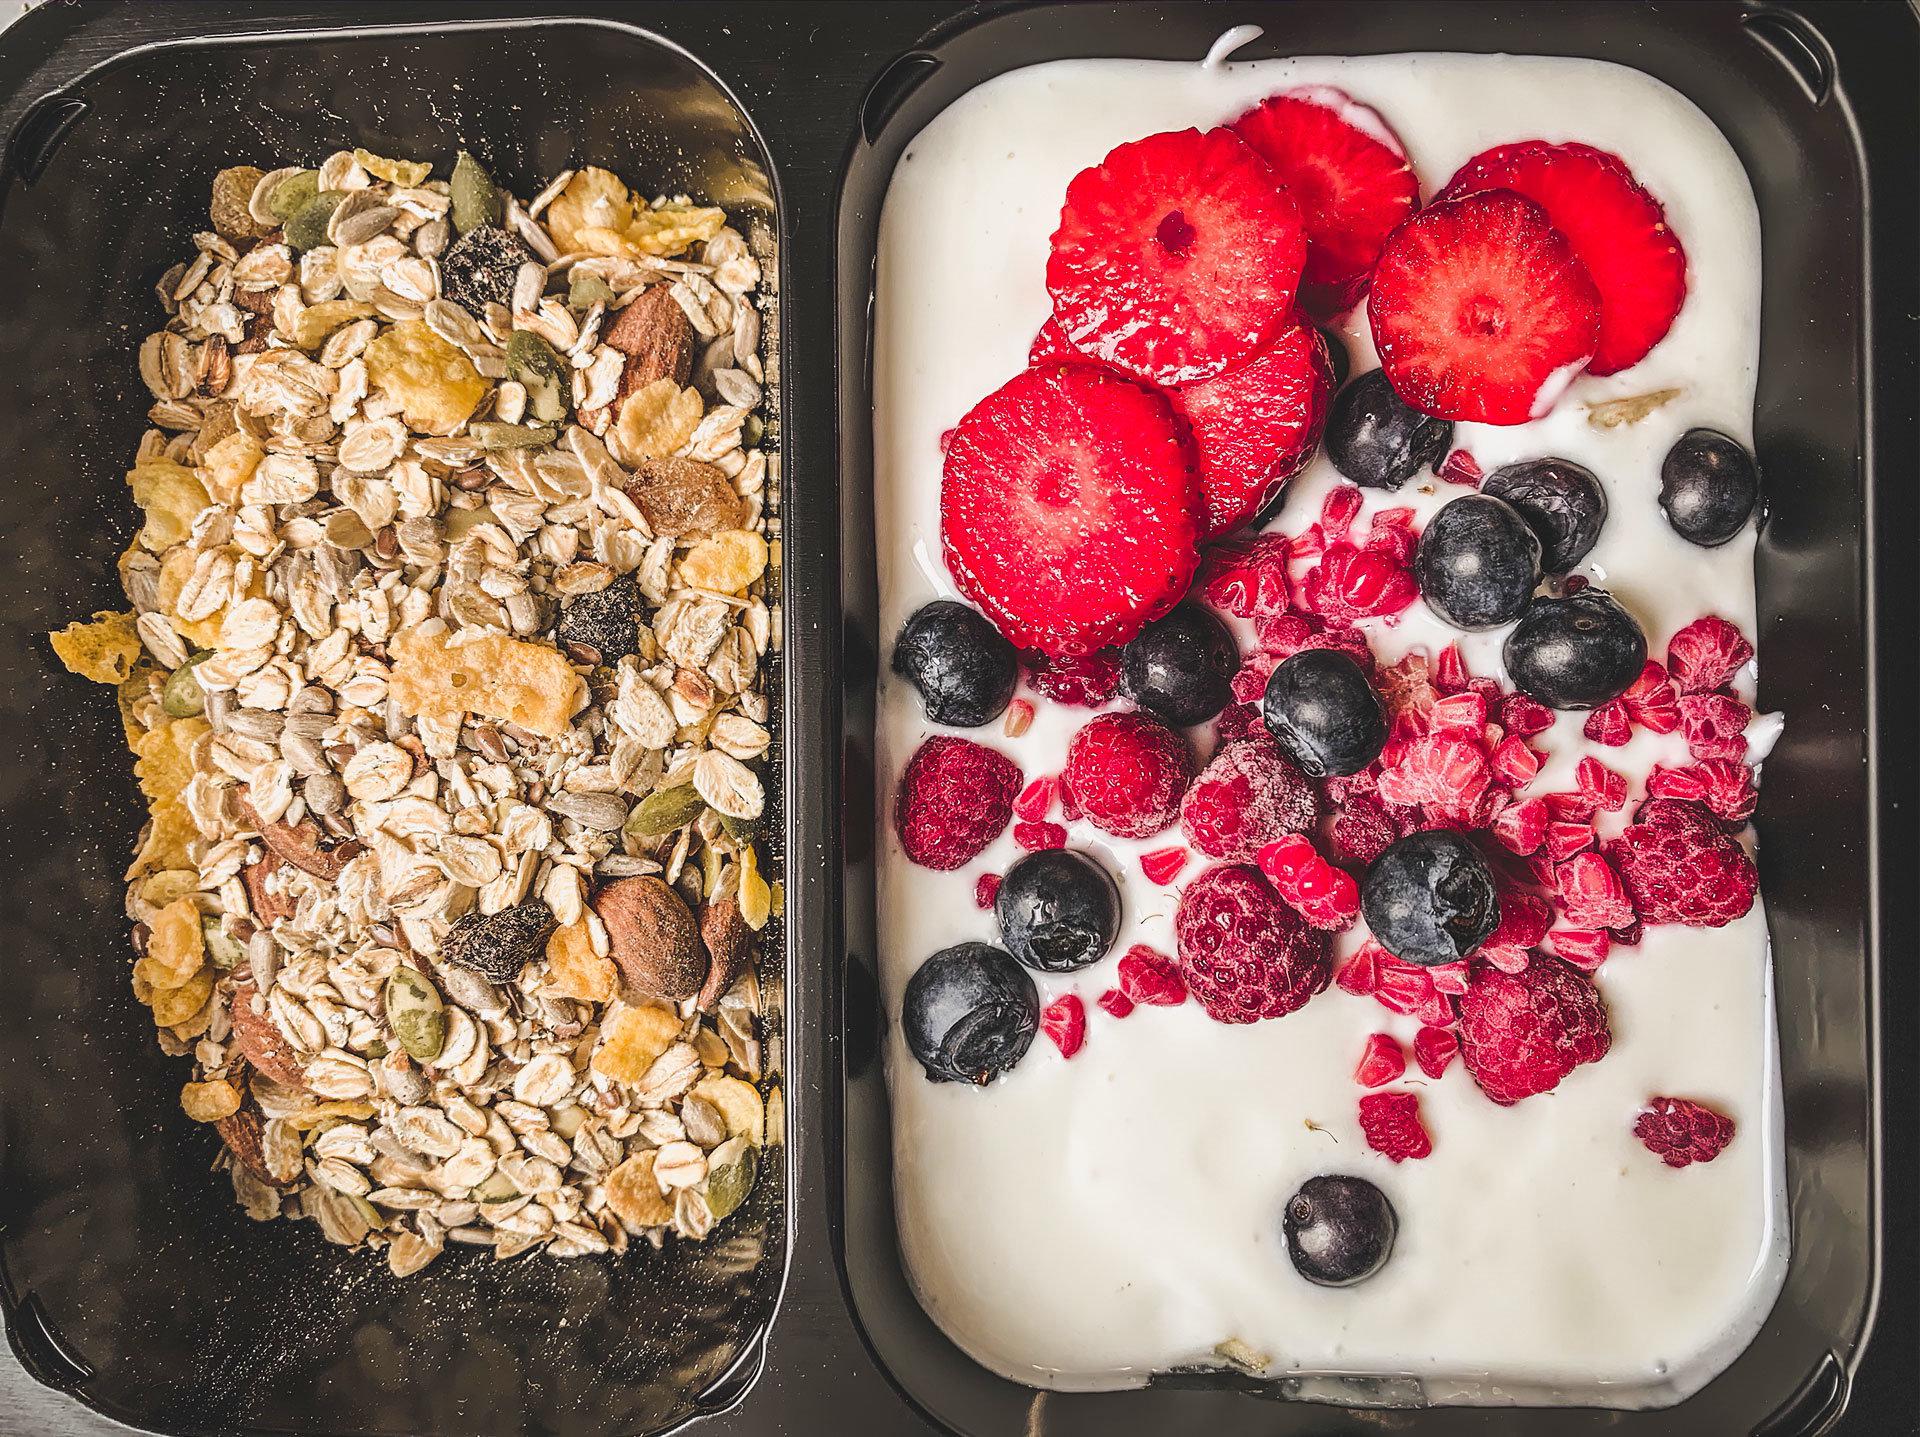 Obrazek Dieta wegetariańska na 20 dni 1200 kalorii